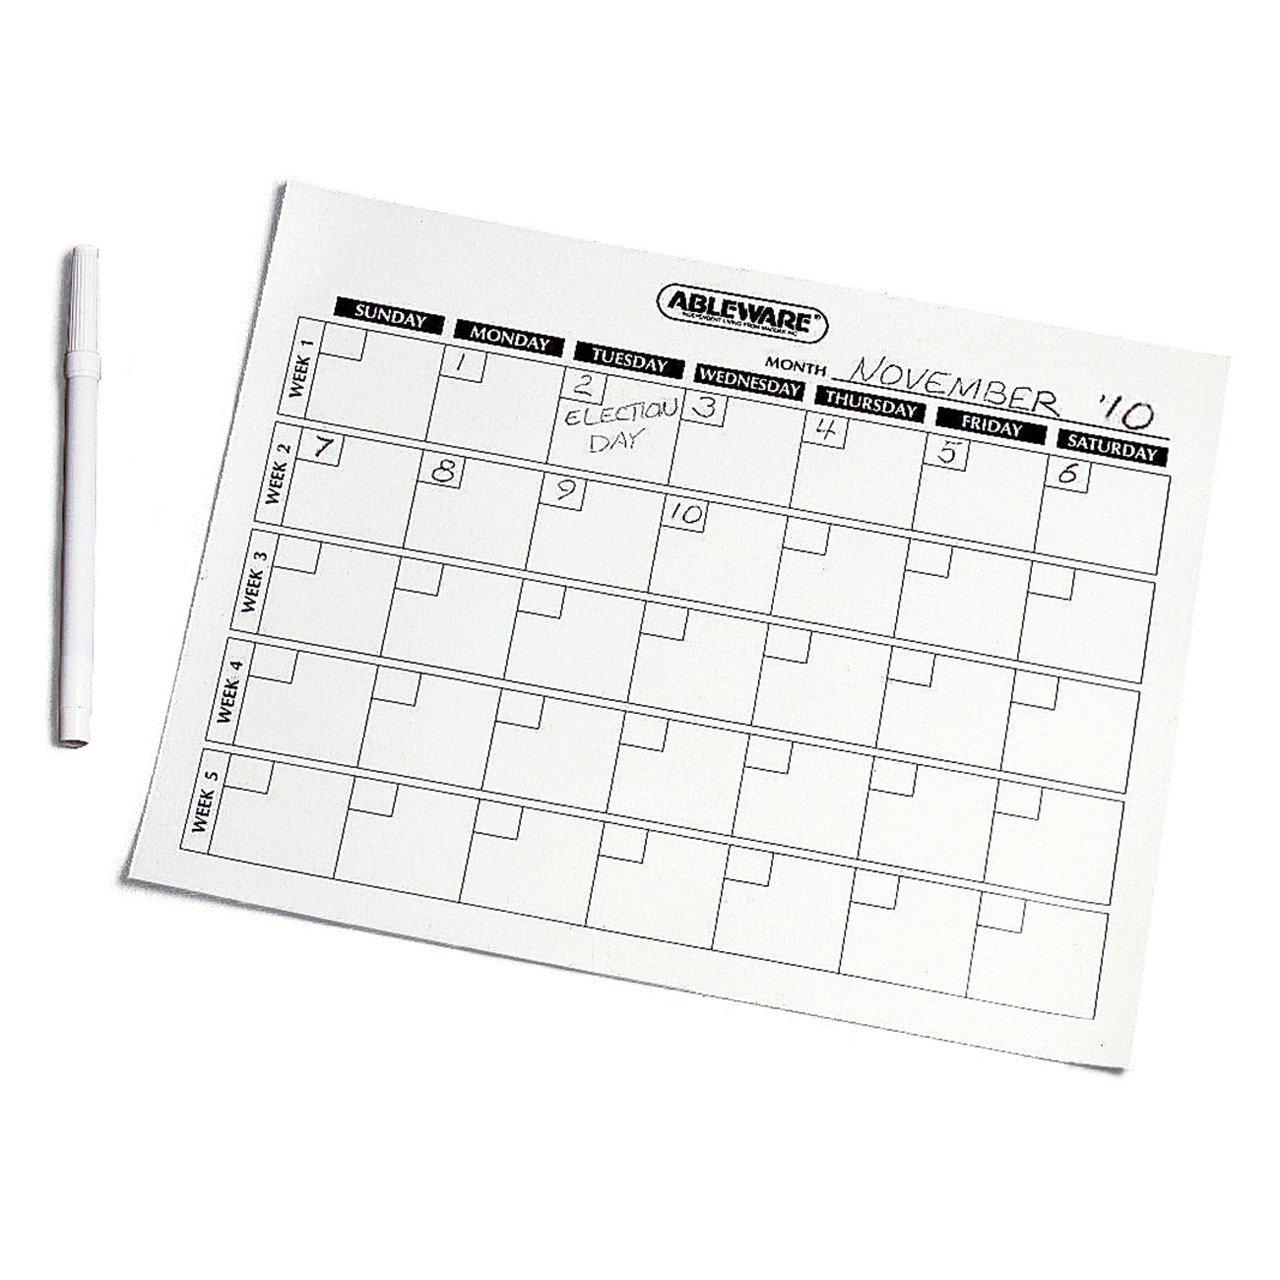 Generic 4 Week Calendar | Calendar Printables Free Templates Free 4 Week Calendar Templates